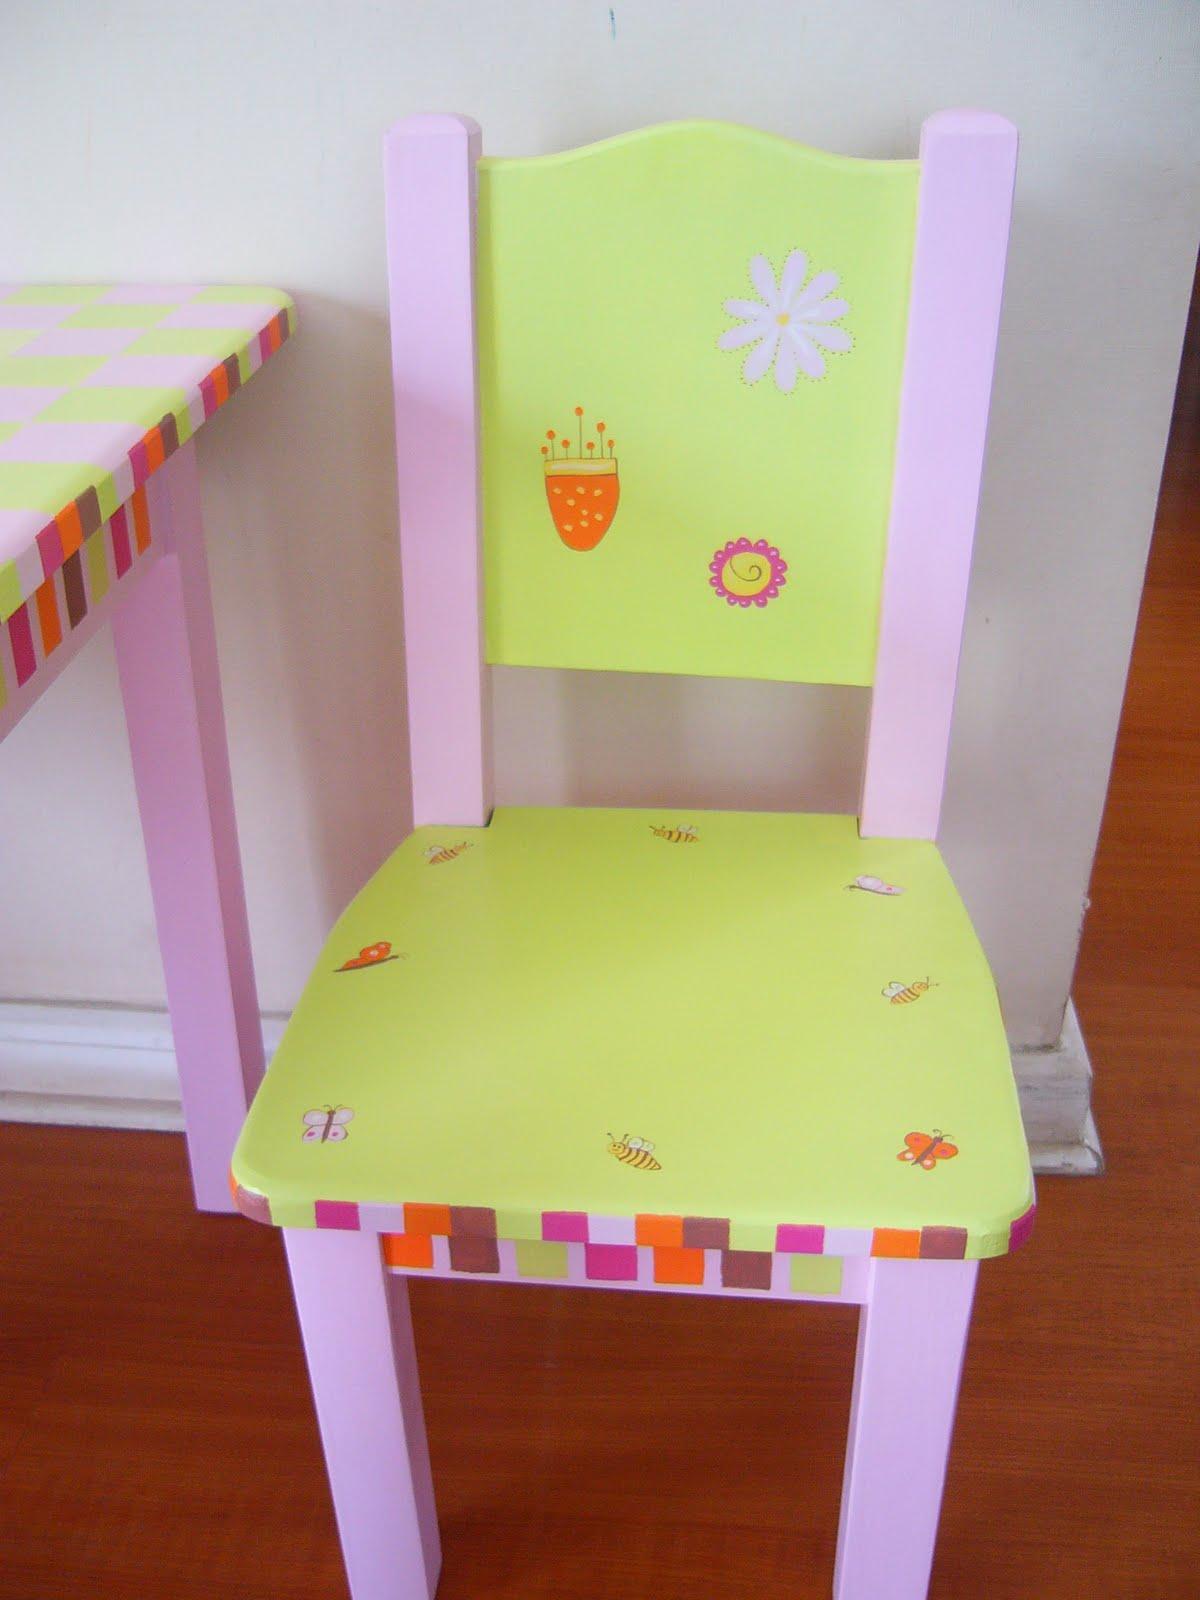 Muebles infantiles decoraci n para ni os juguetes tejidos manualidades cocina etc 12 17 10 - Manualidades cocina para ninos ...